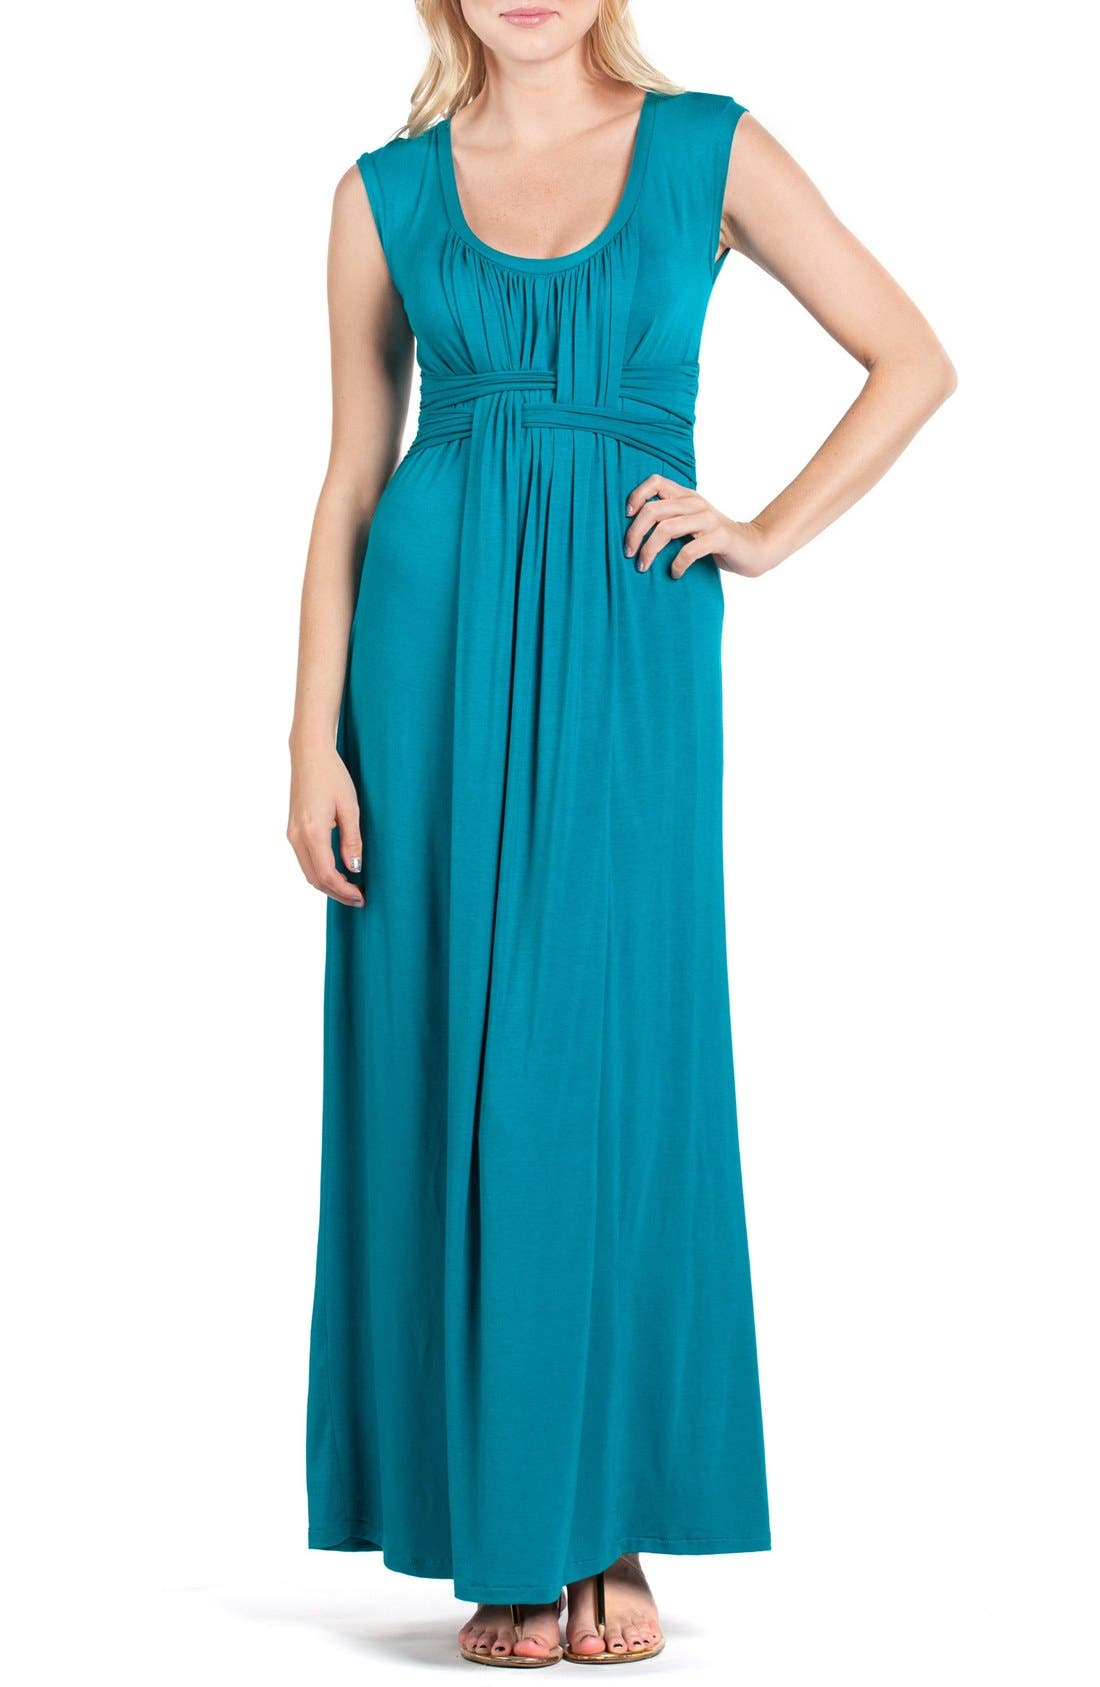 Savi Mom Athens Maternity/nursing Maxi Dress, Green